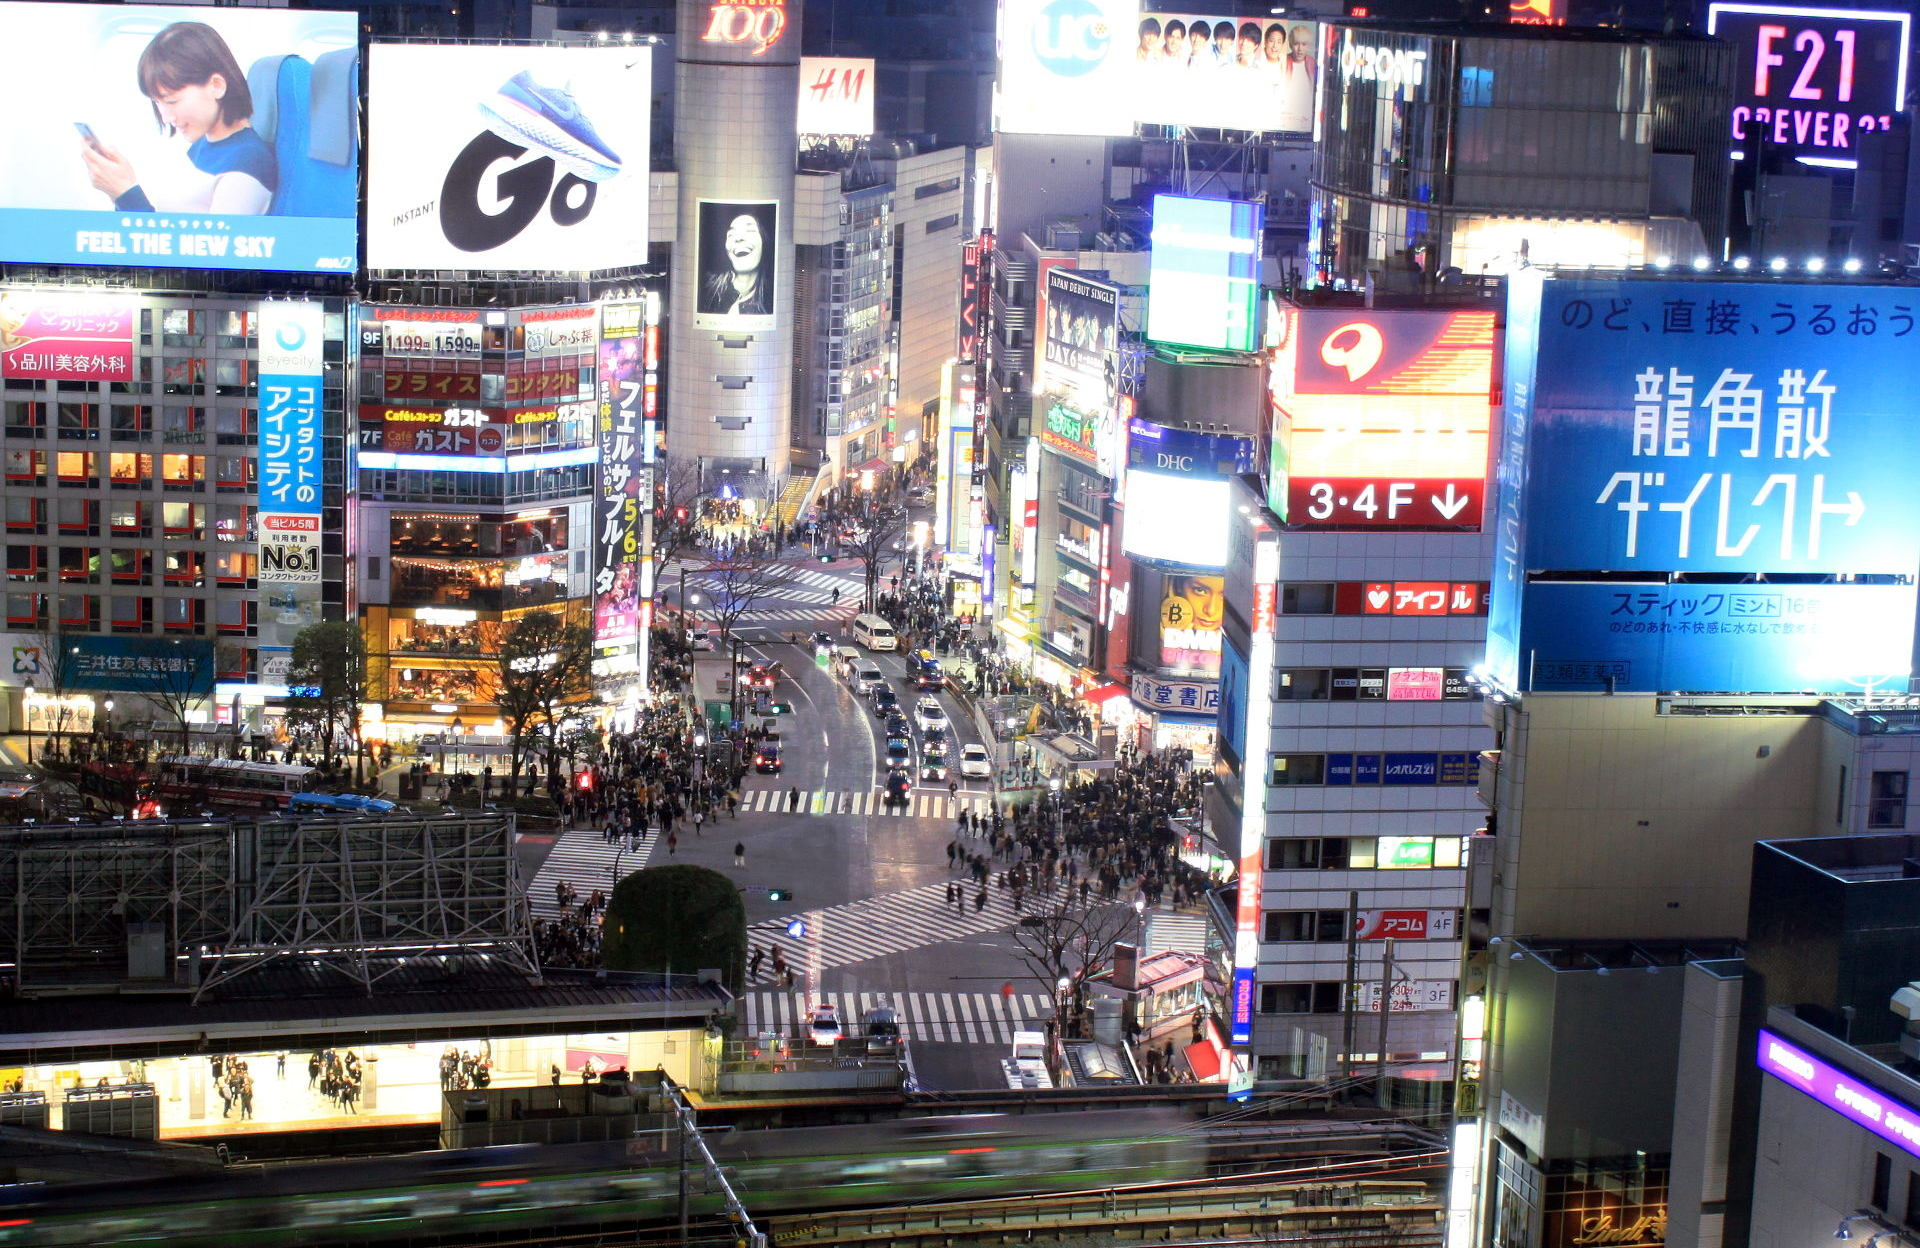 shibuya crossing tokyo iglawpodrozy